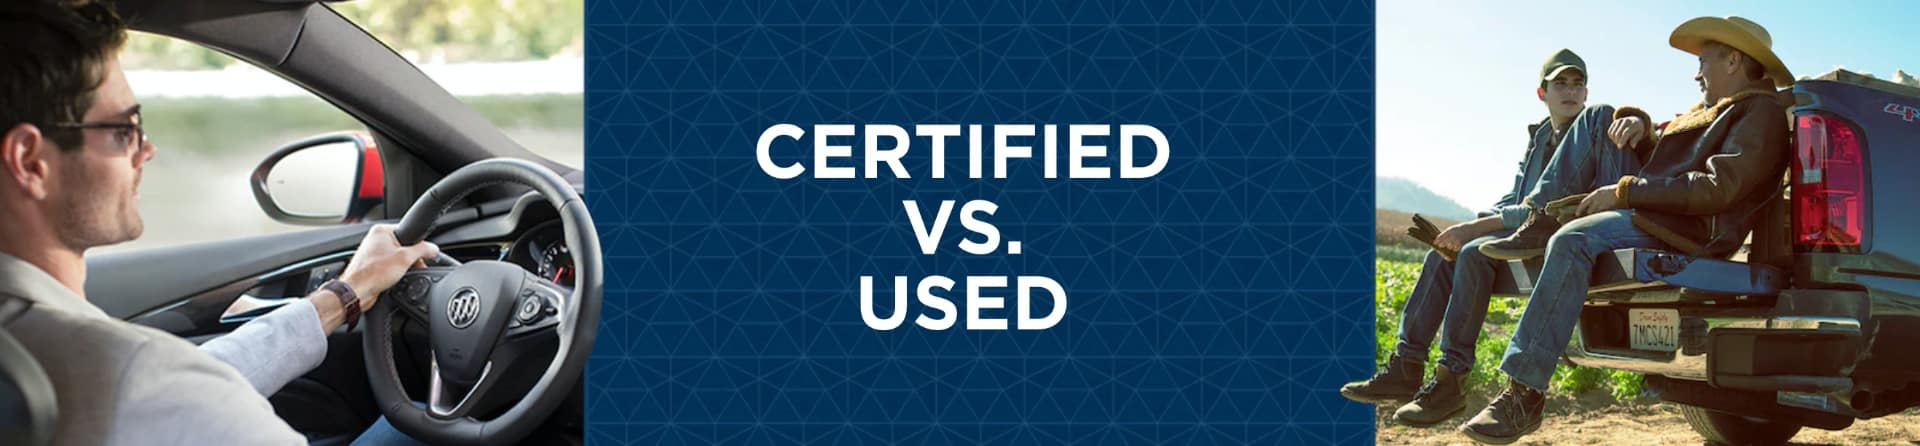 Certified vs Used